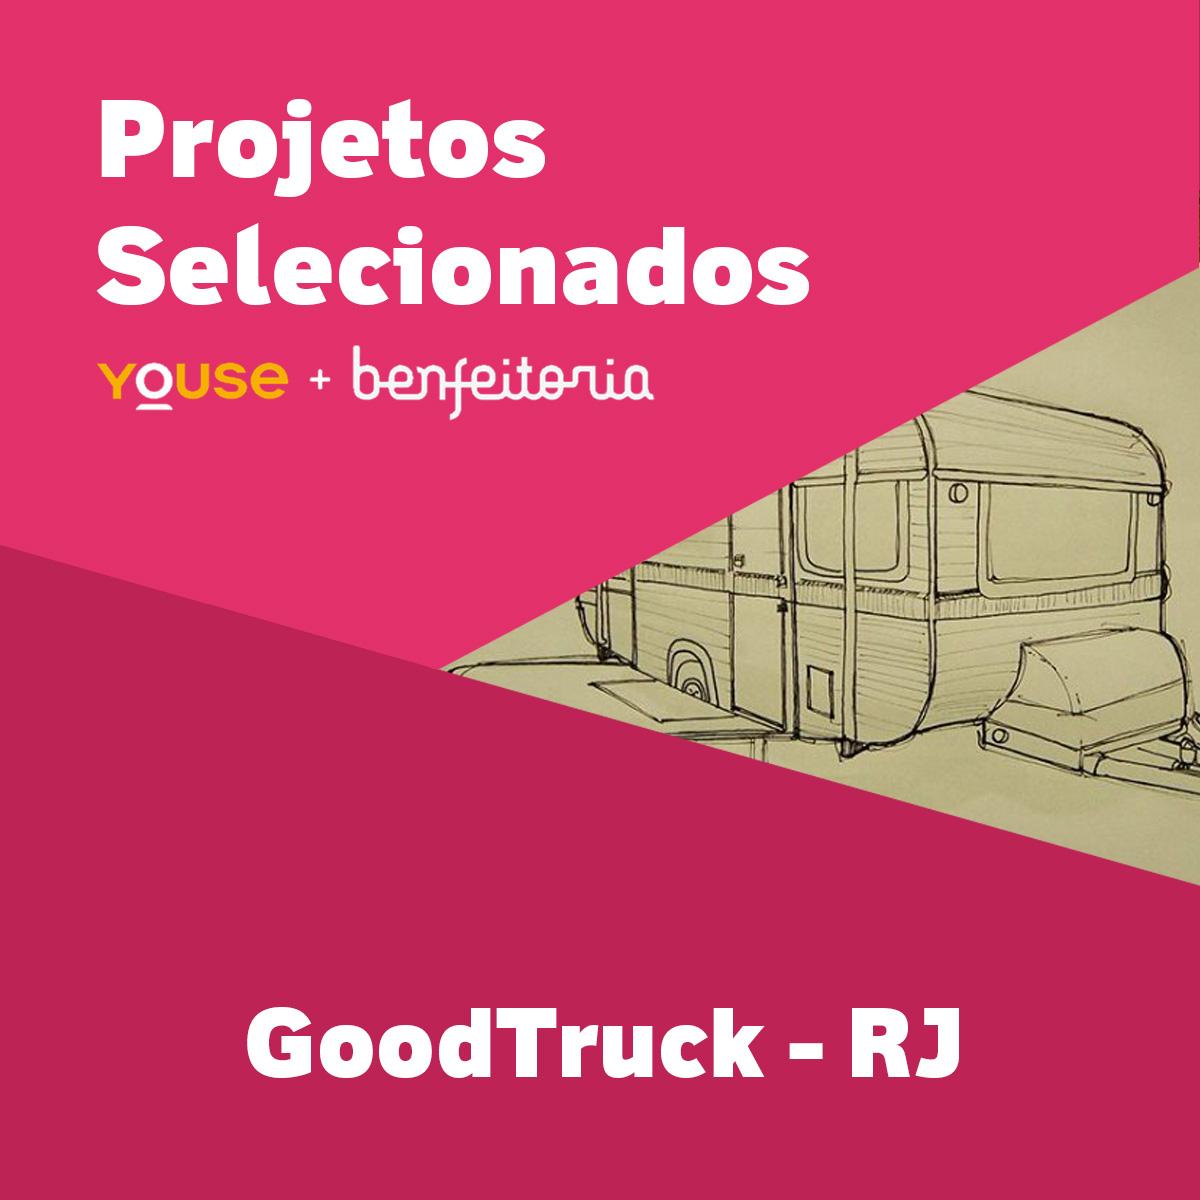 Projetos Selecionados - GoodTruck - RJ